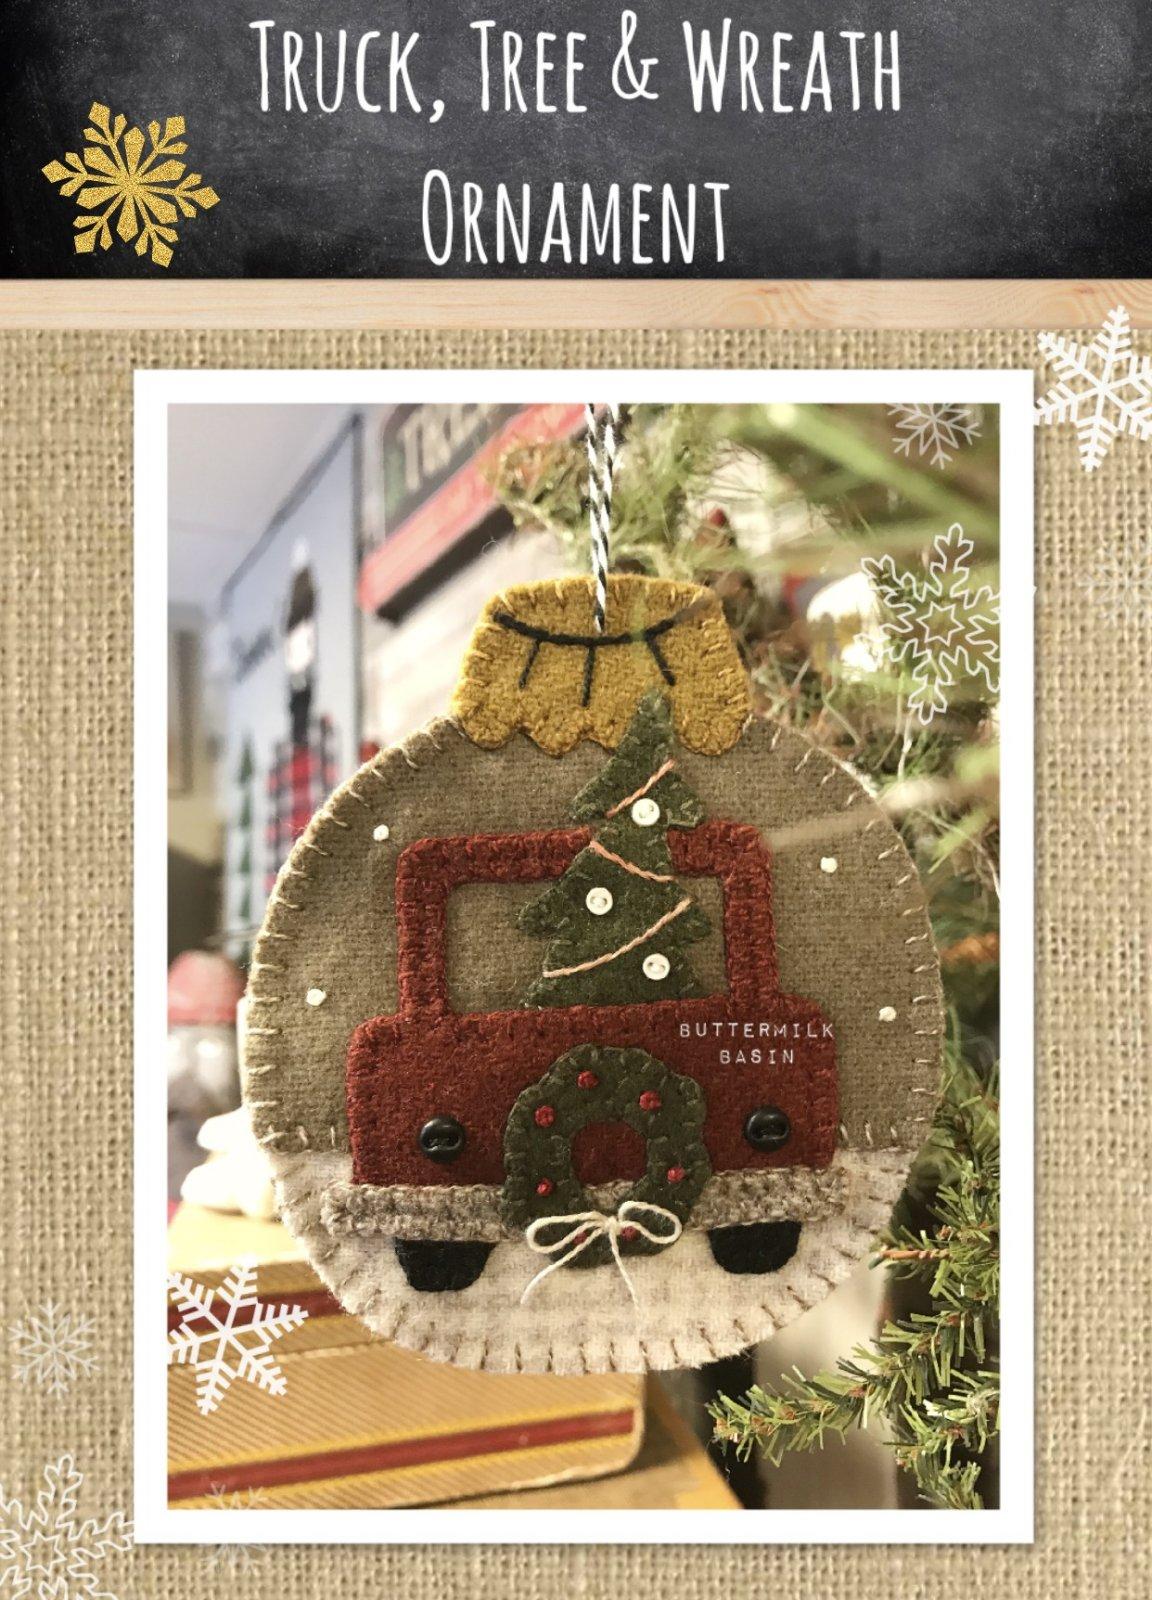 Truck, Tree & Wreath Ornament